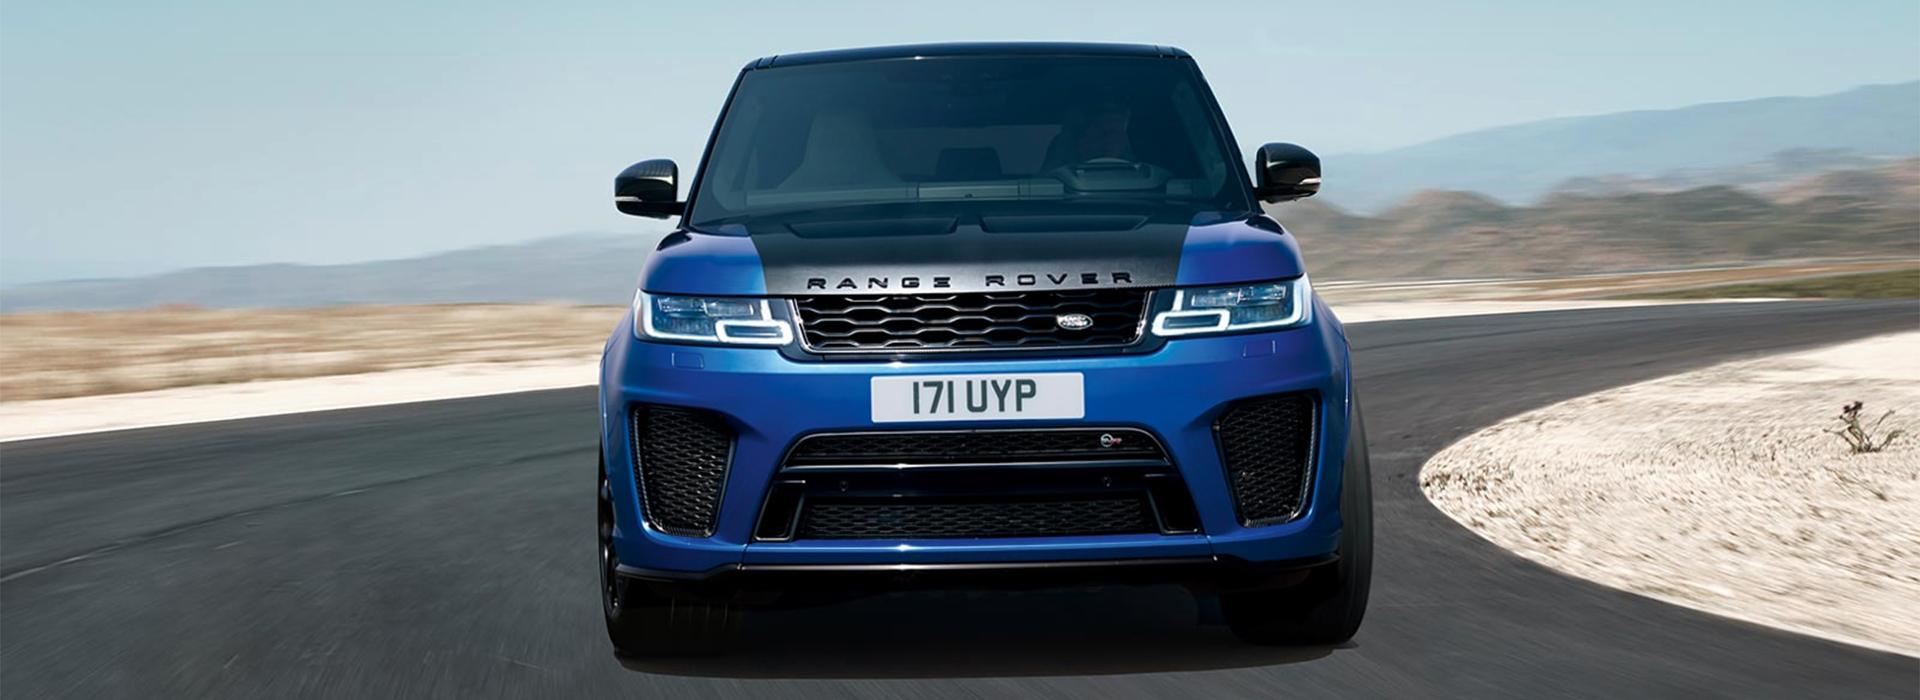 2021 Range Rover Sport Hero